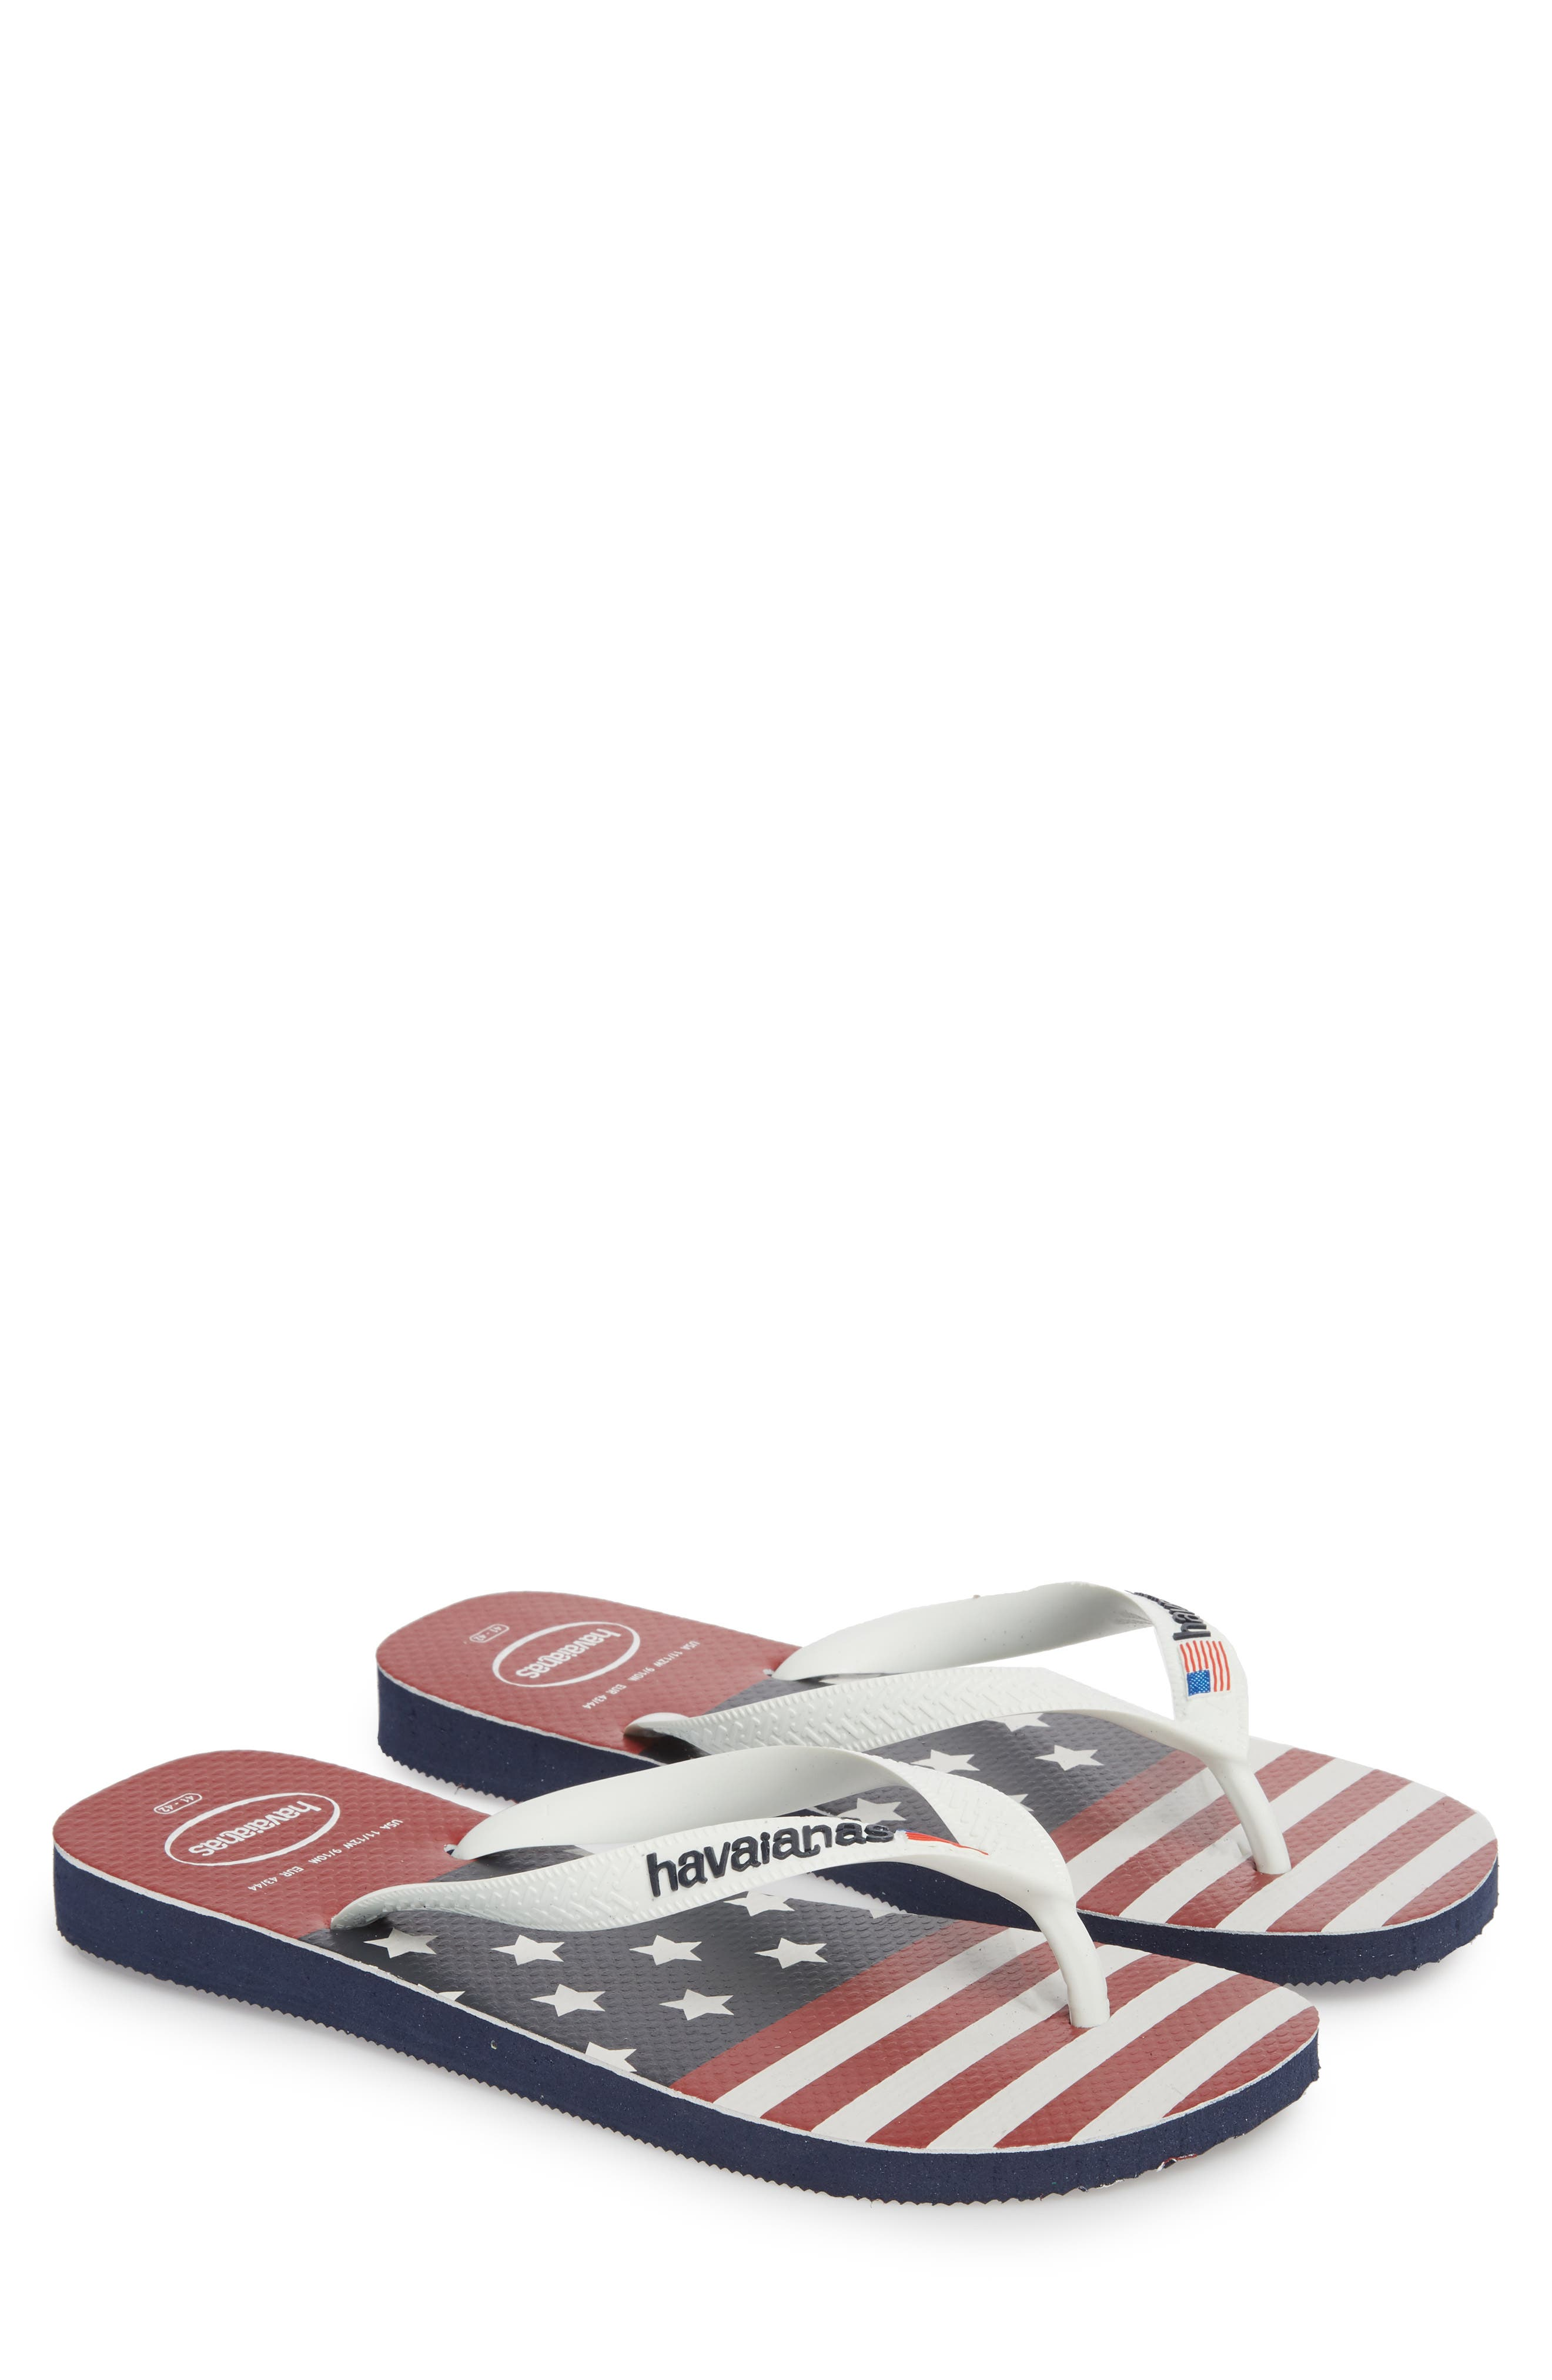 USA Stars & Stripes Flip Flop,                             Alternate thumbnail 2, color,                             Navy Blue